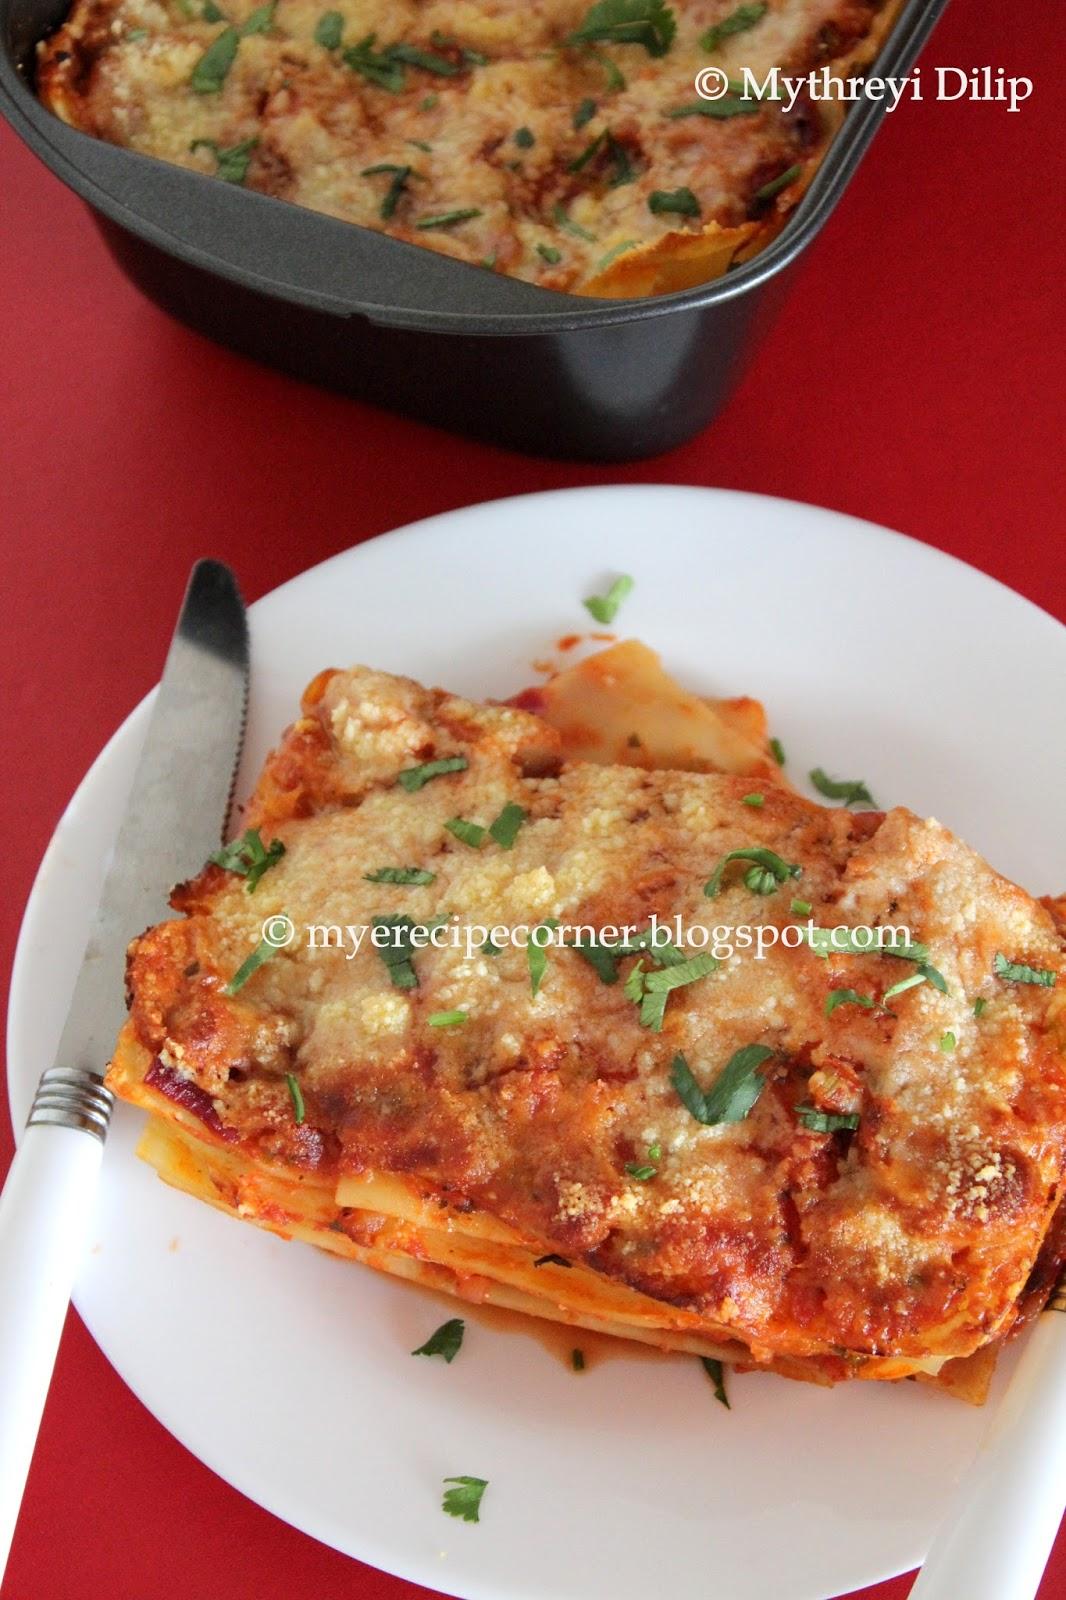 Mushroom lasagna vegetarian meatless lasagna recipe chicken mushroom lasagna vegetarian meatless lasagna recipe forumfinder Image collections